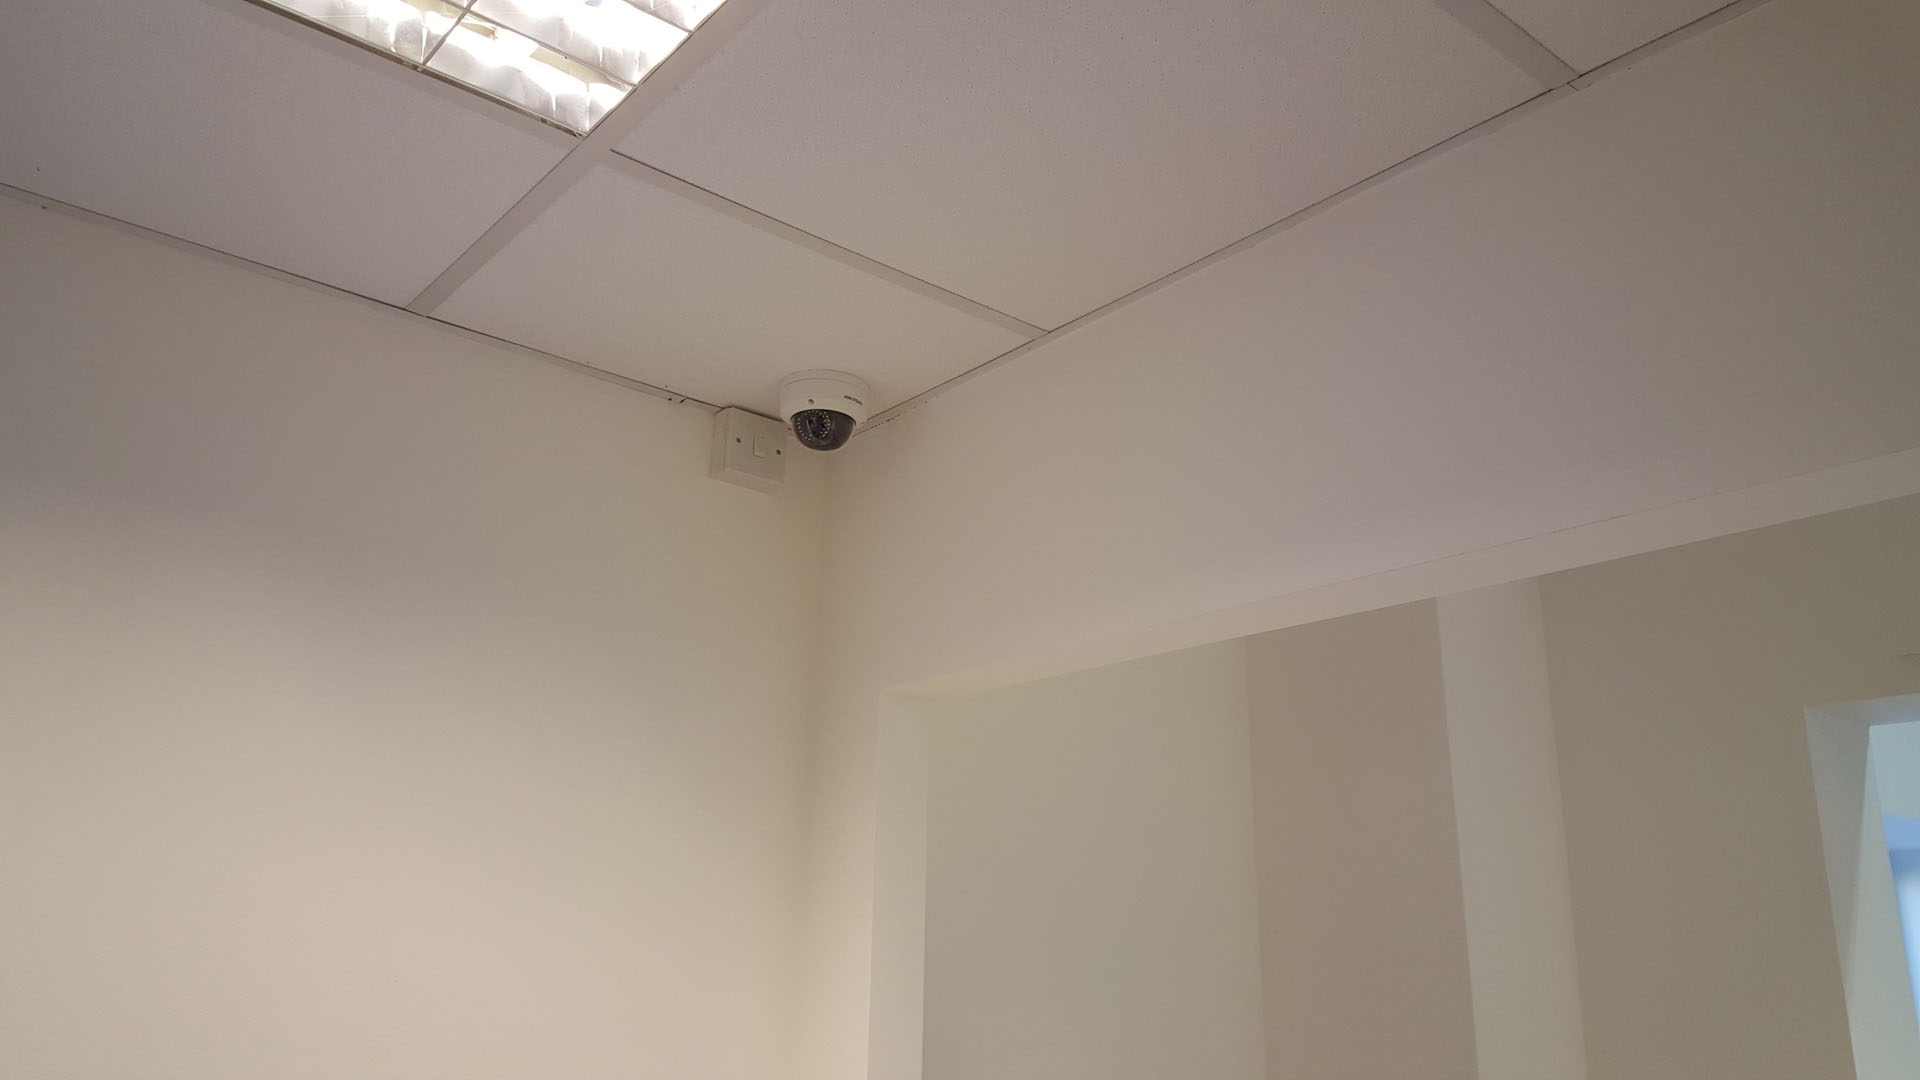 CCTV Installation in Loughton